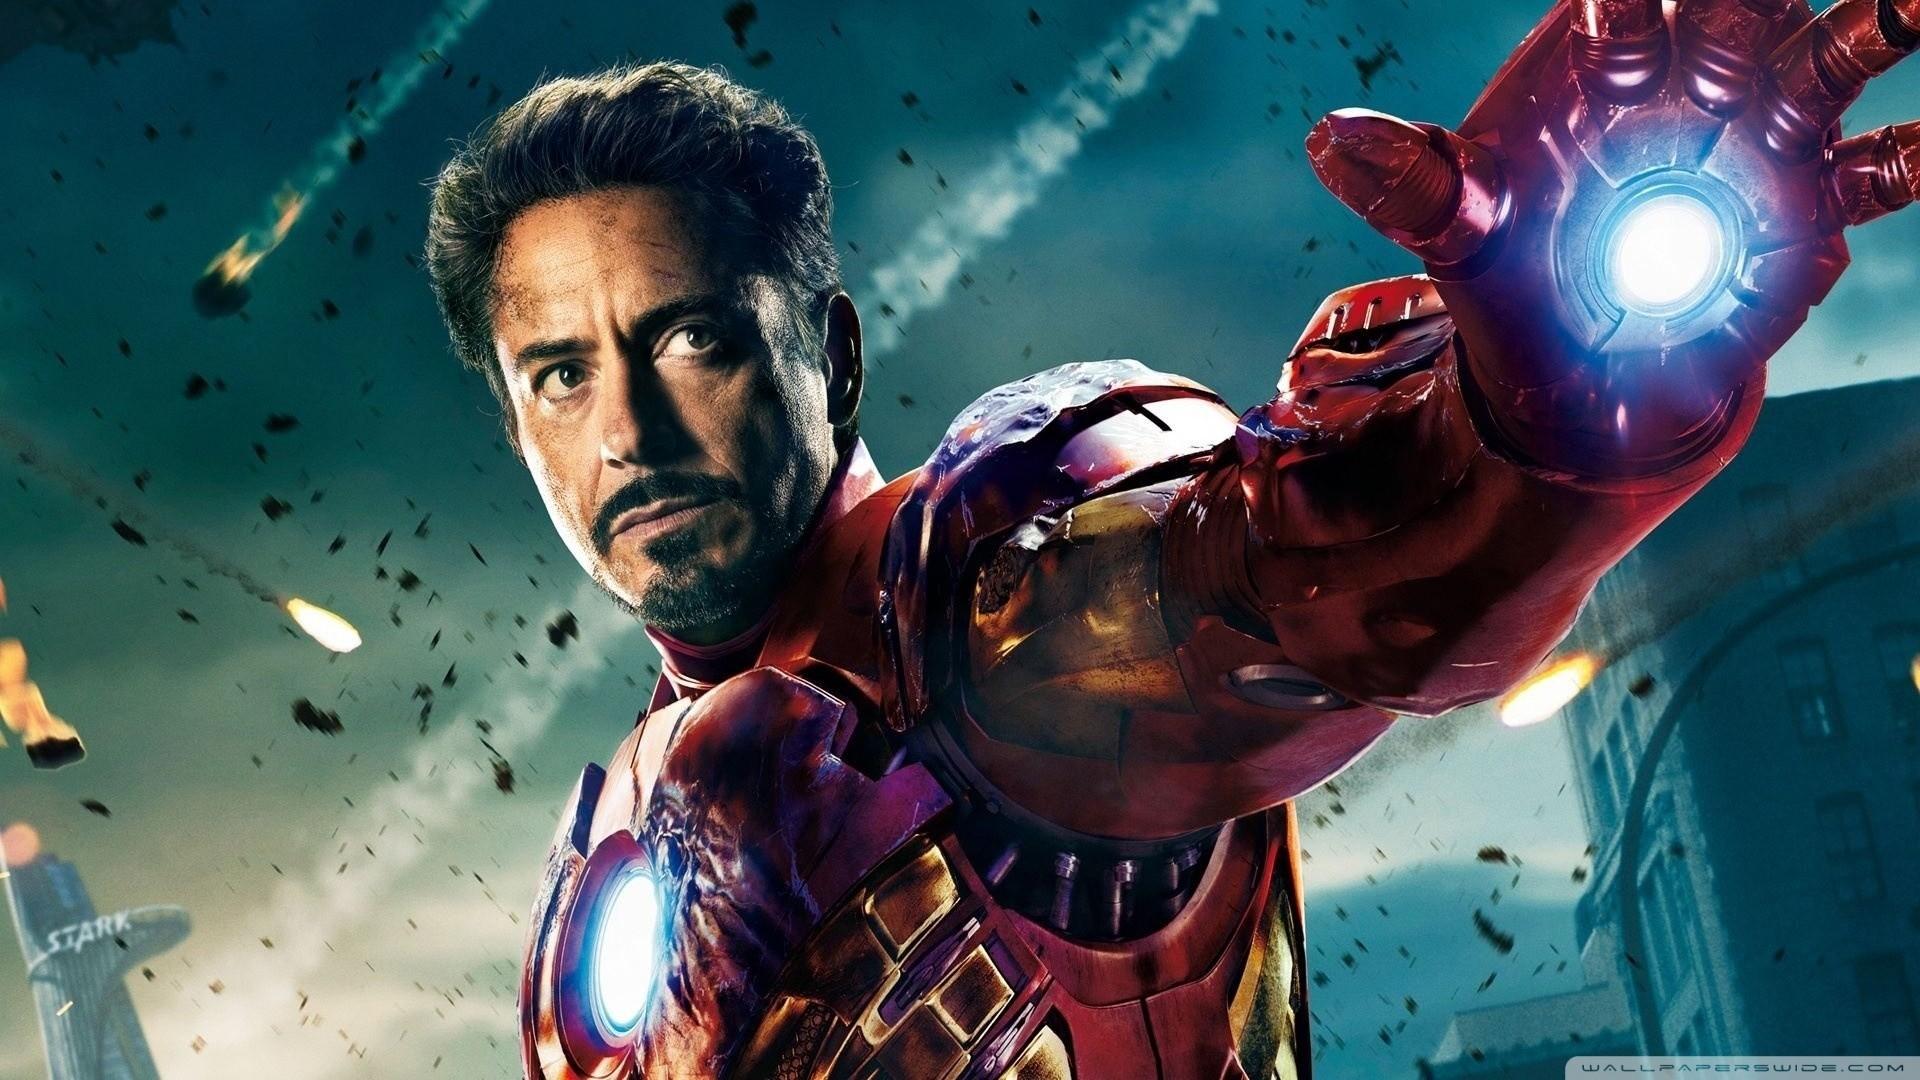 Fantastic Wallpaper Marvel Portrait - movies-superhero-Iron-Man-The-Avengers-Marvel-Cinematic-Universe-comics-Robert-Downey-Jr-Tony-Stark-screenshot-computer-wallpaper-fictional-character-comic-book-230619  Collection_717782.jpg